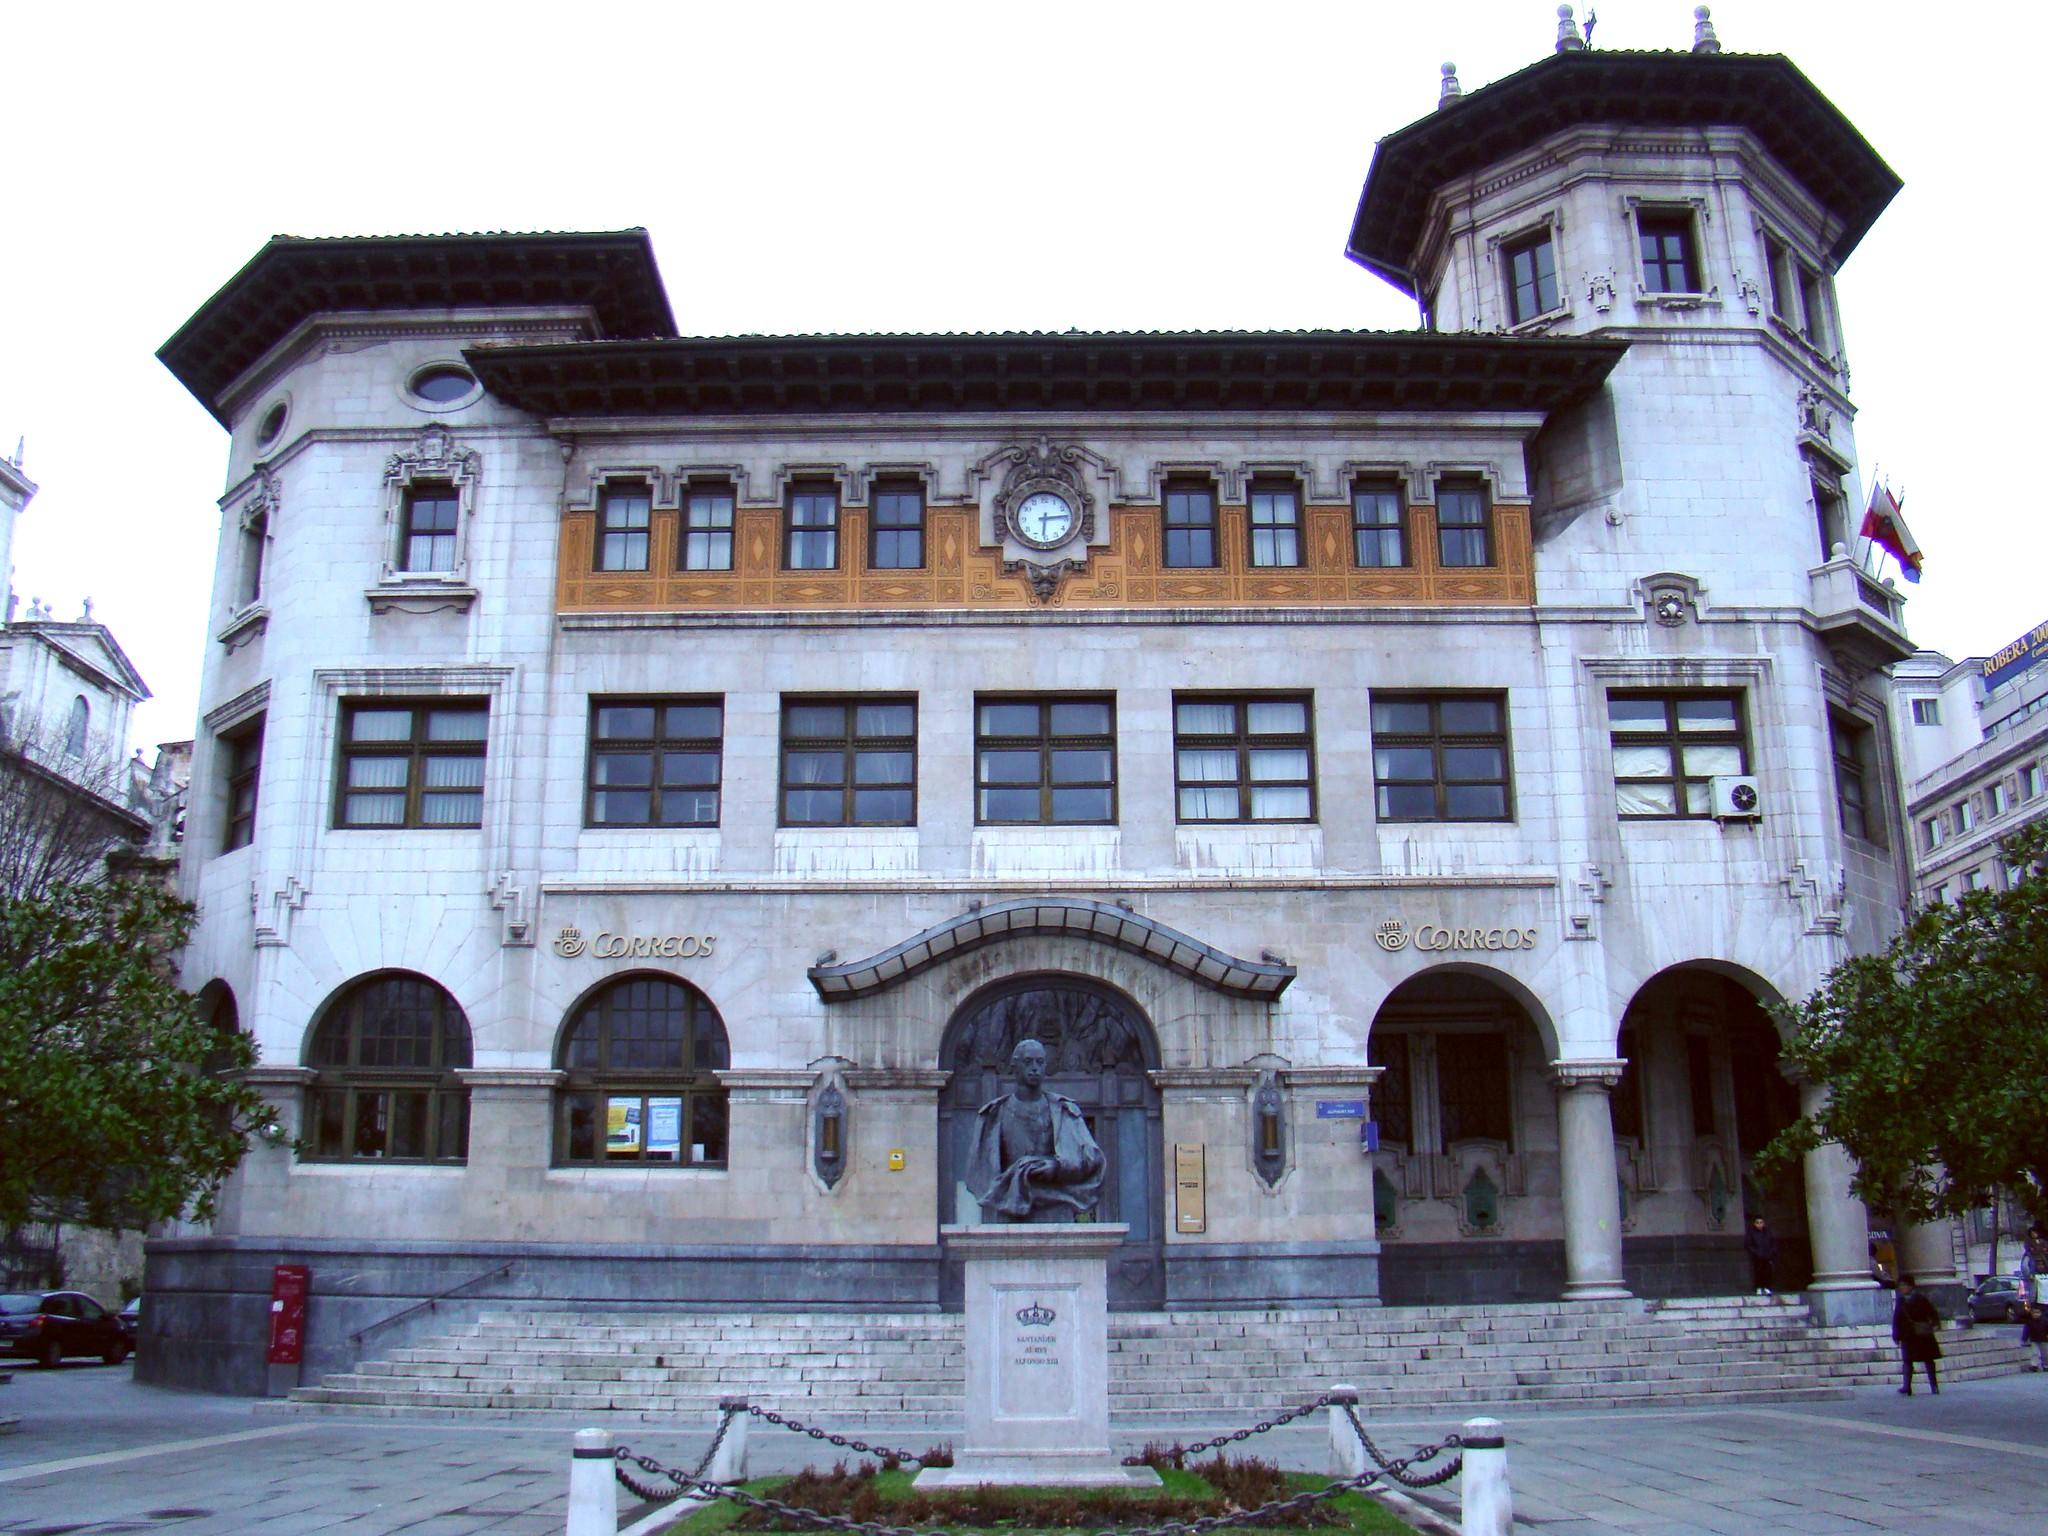 edificio Oficina de Correos Santander Cantabria